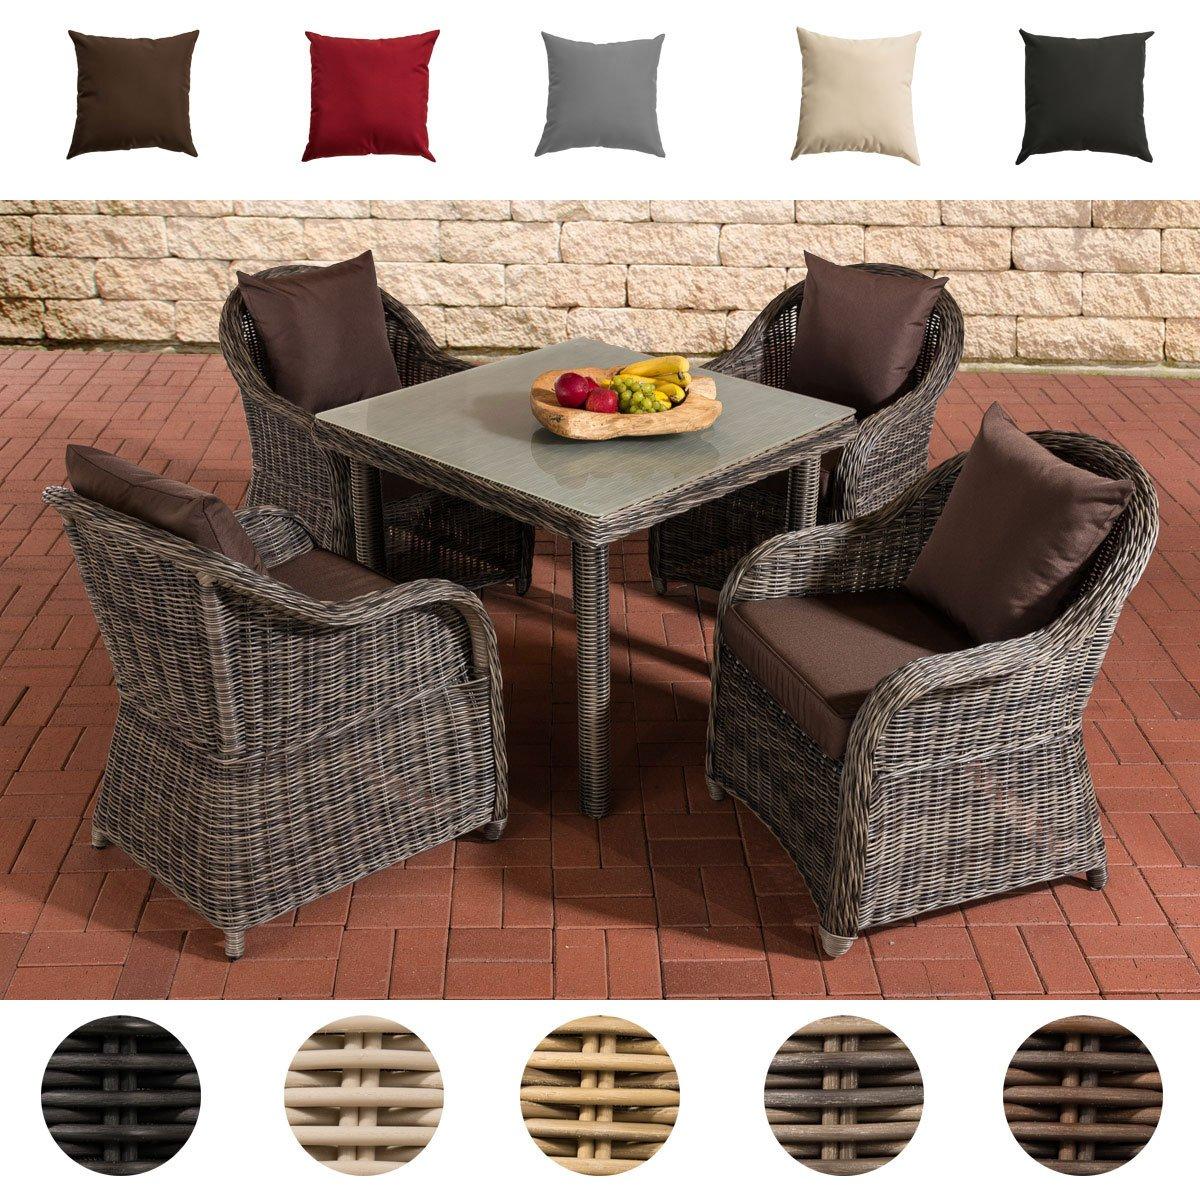 clp poly rattan garten sitzgruppe san juan xl tischplatte milchglas 4 garten sessel. Black Bedroom Furniture Sets. Home Design Ideas